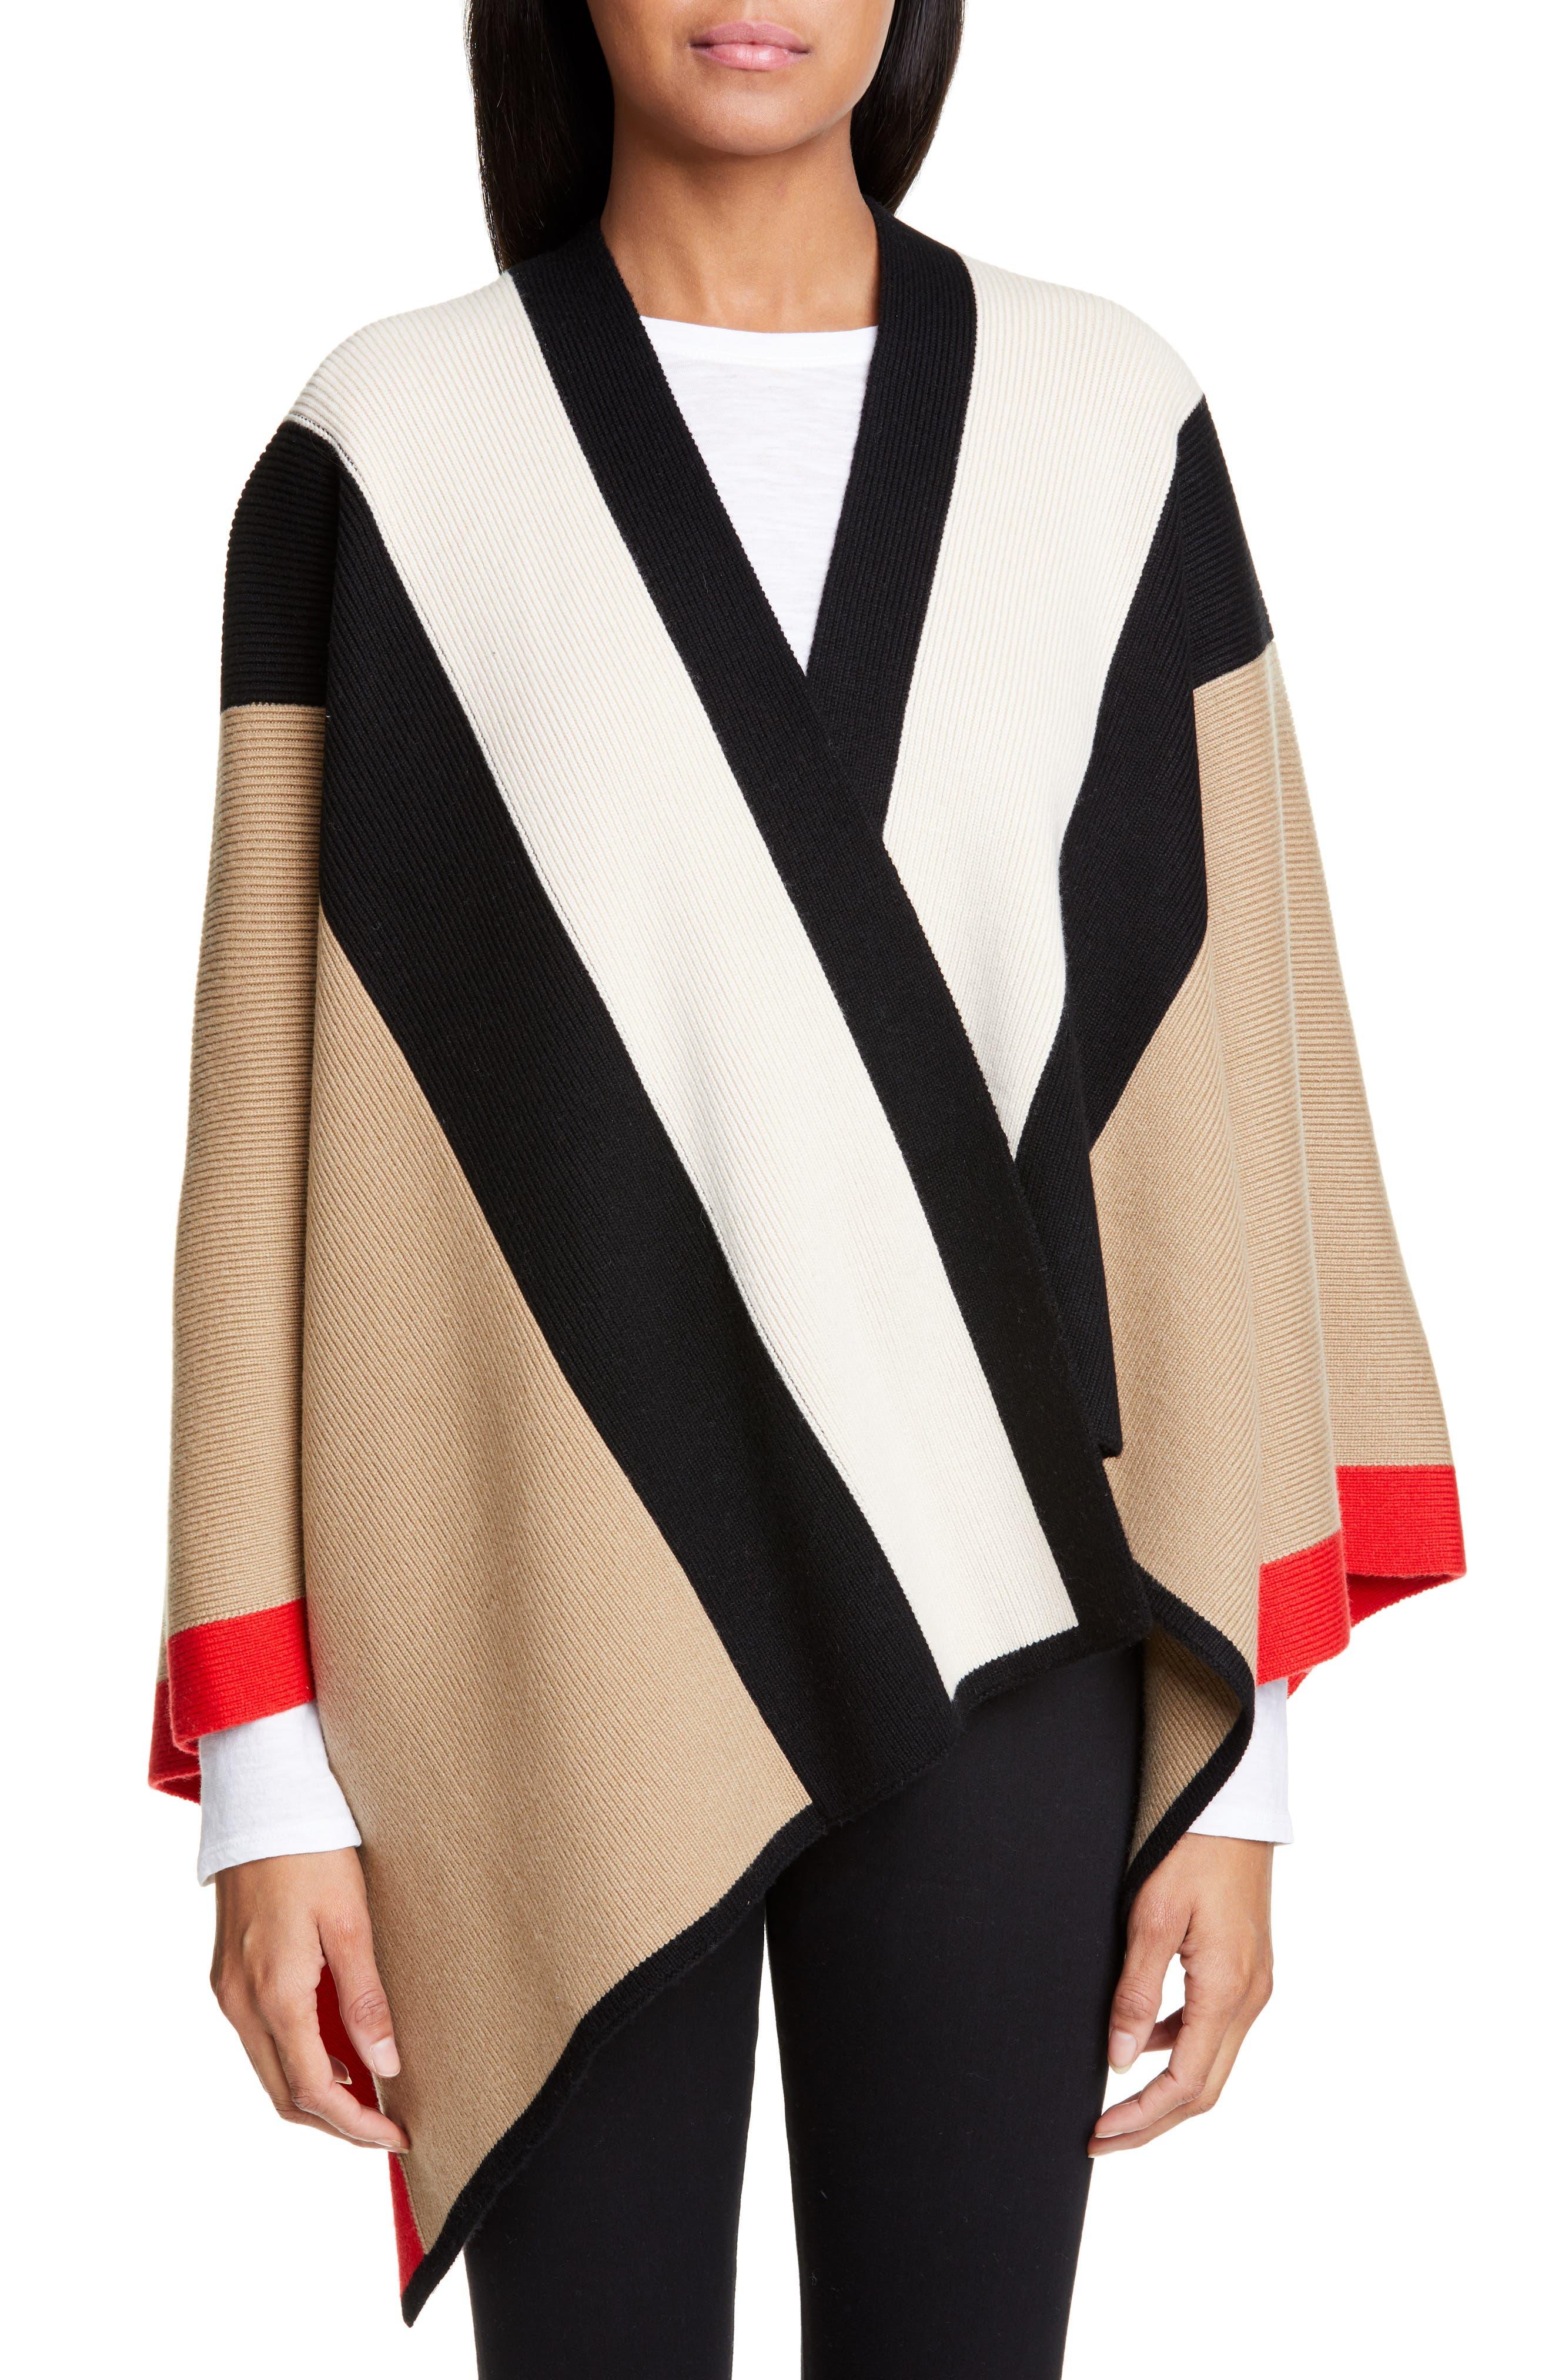 BURBERRY, Stripe Wool & Cashmere Cape, Main thumbnail 1, color, CAMEL